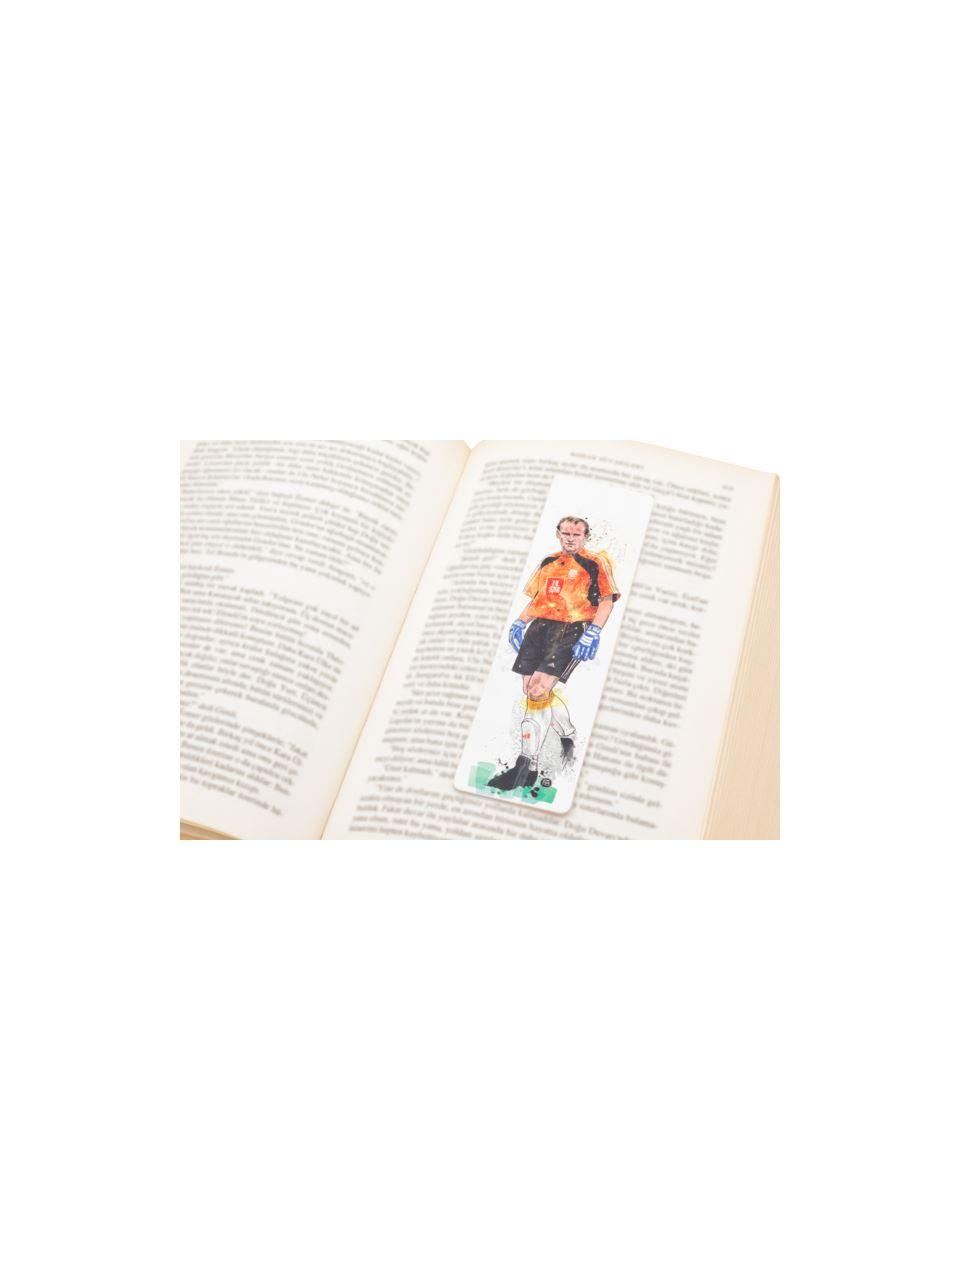 U88119 Taffarel Standart Kitap Ayracı